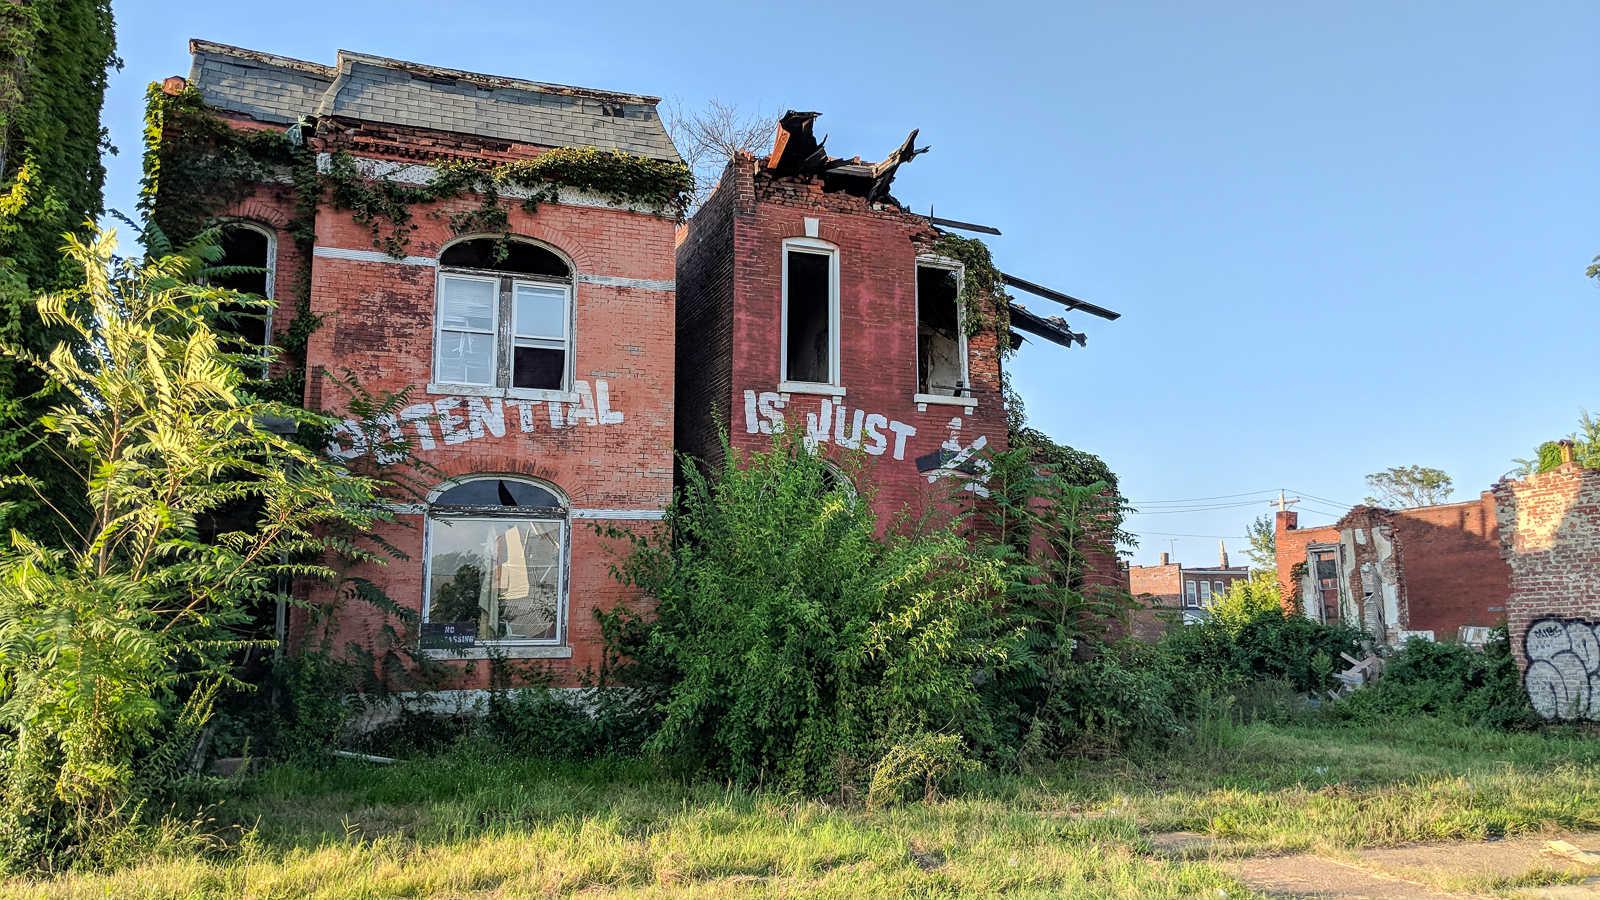 Broken Promises: Landmarks Association Surveys 155 Properties McKee Planned to Renovate in 2009